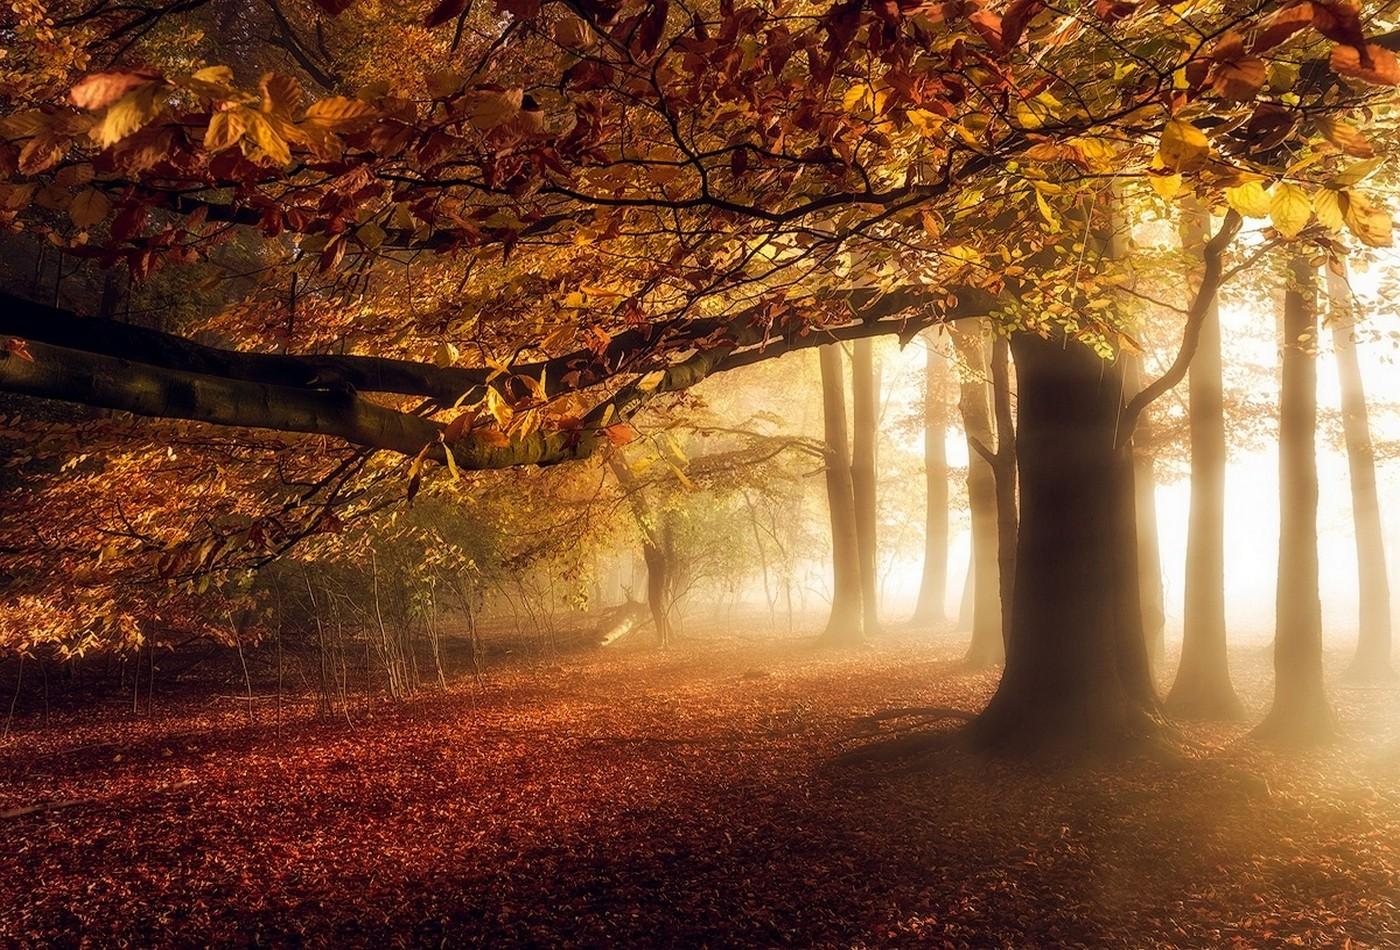 Fall Wallpaper Cars Nature Landscape Fall Sunrise Mist Forest Leaves